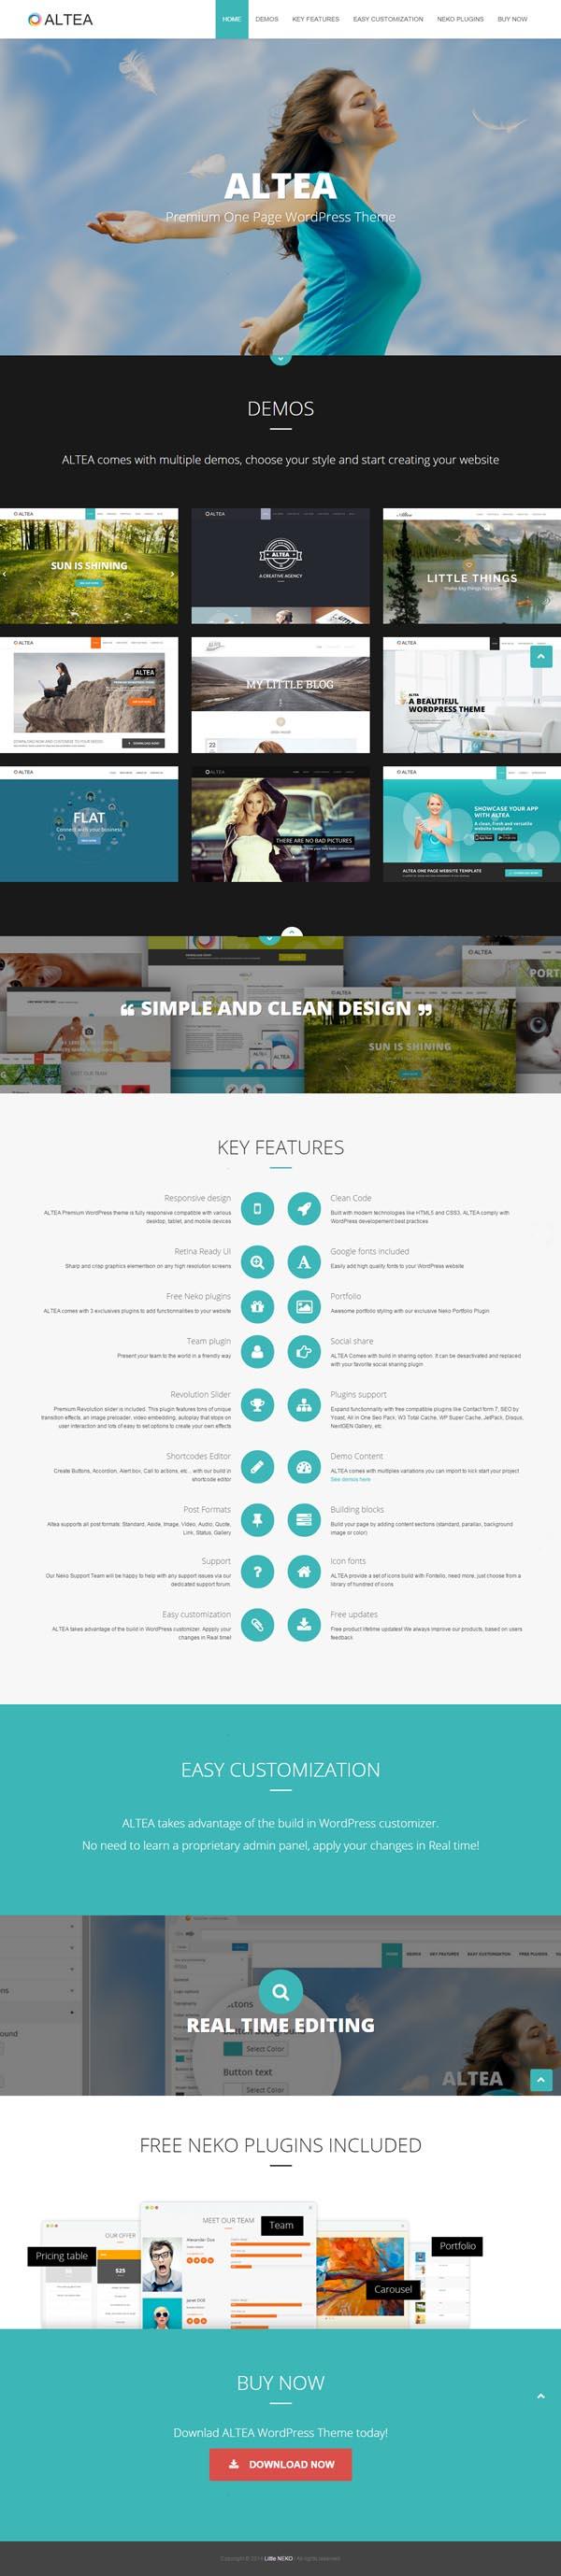 Altea - One Page WordPress Theme #wordpressthemes #html5templates #responsivedesign #html5themes #newwordpressthemes